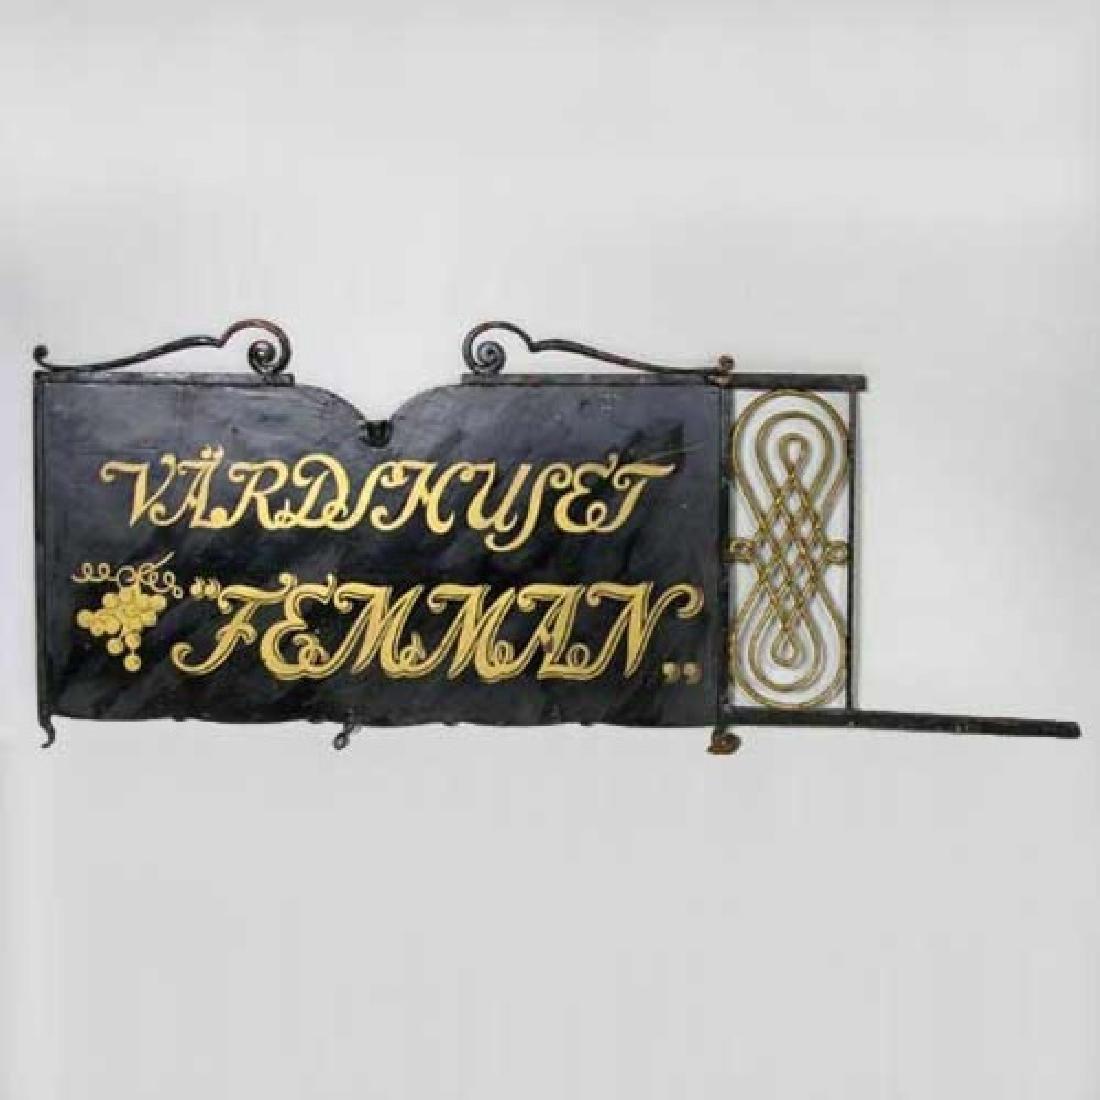 Swedish Painted Iron Bracket Hotel Building Trade Sign